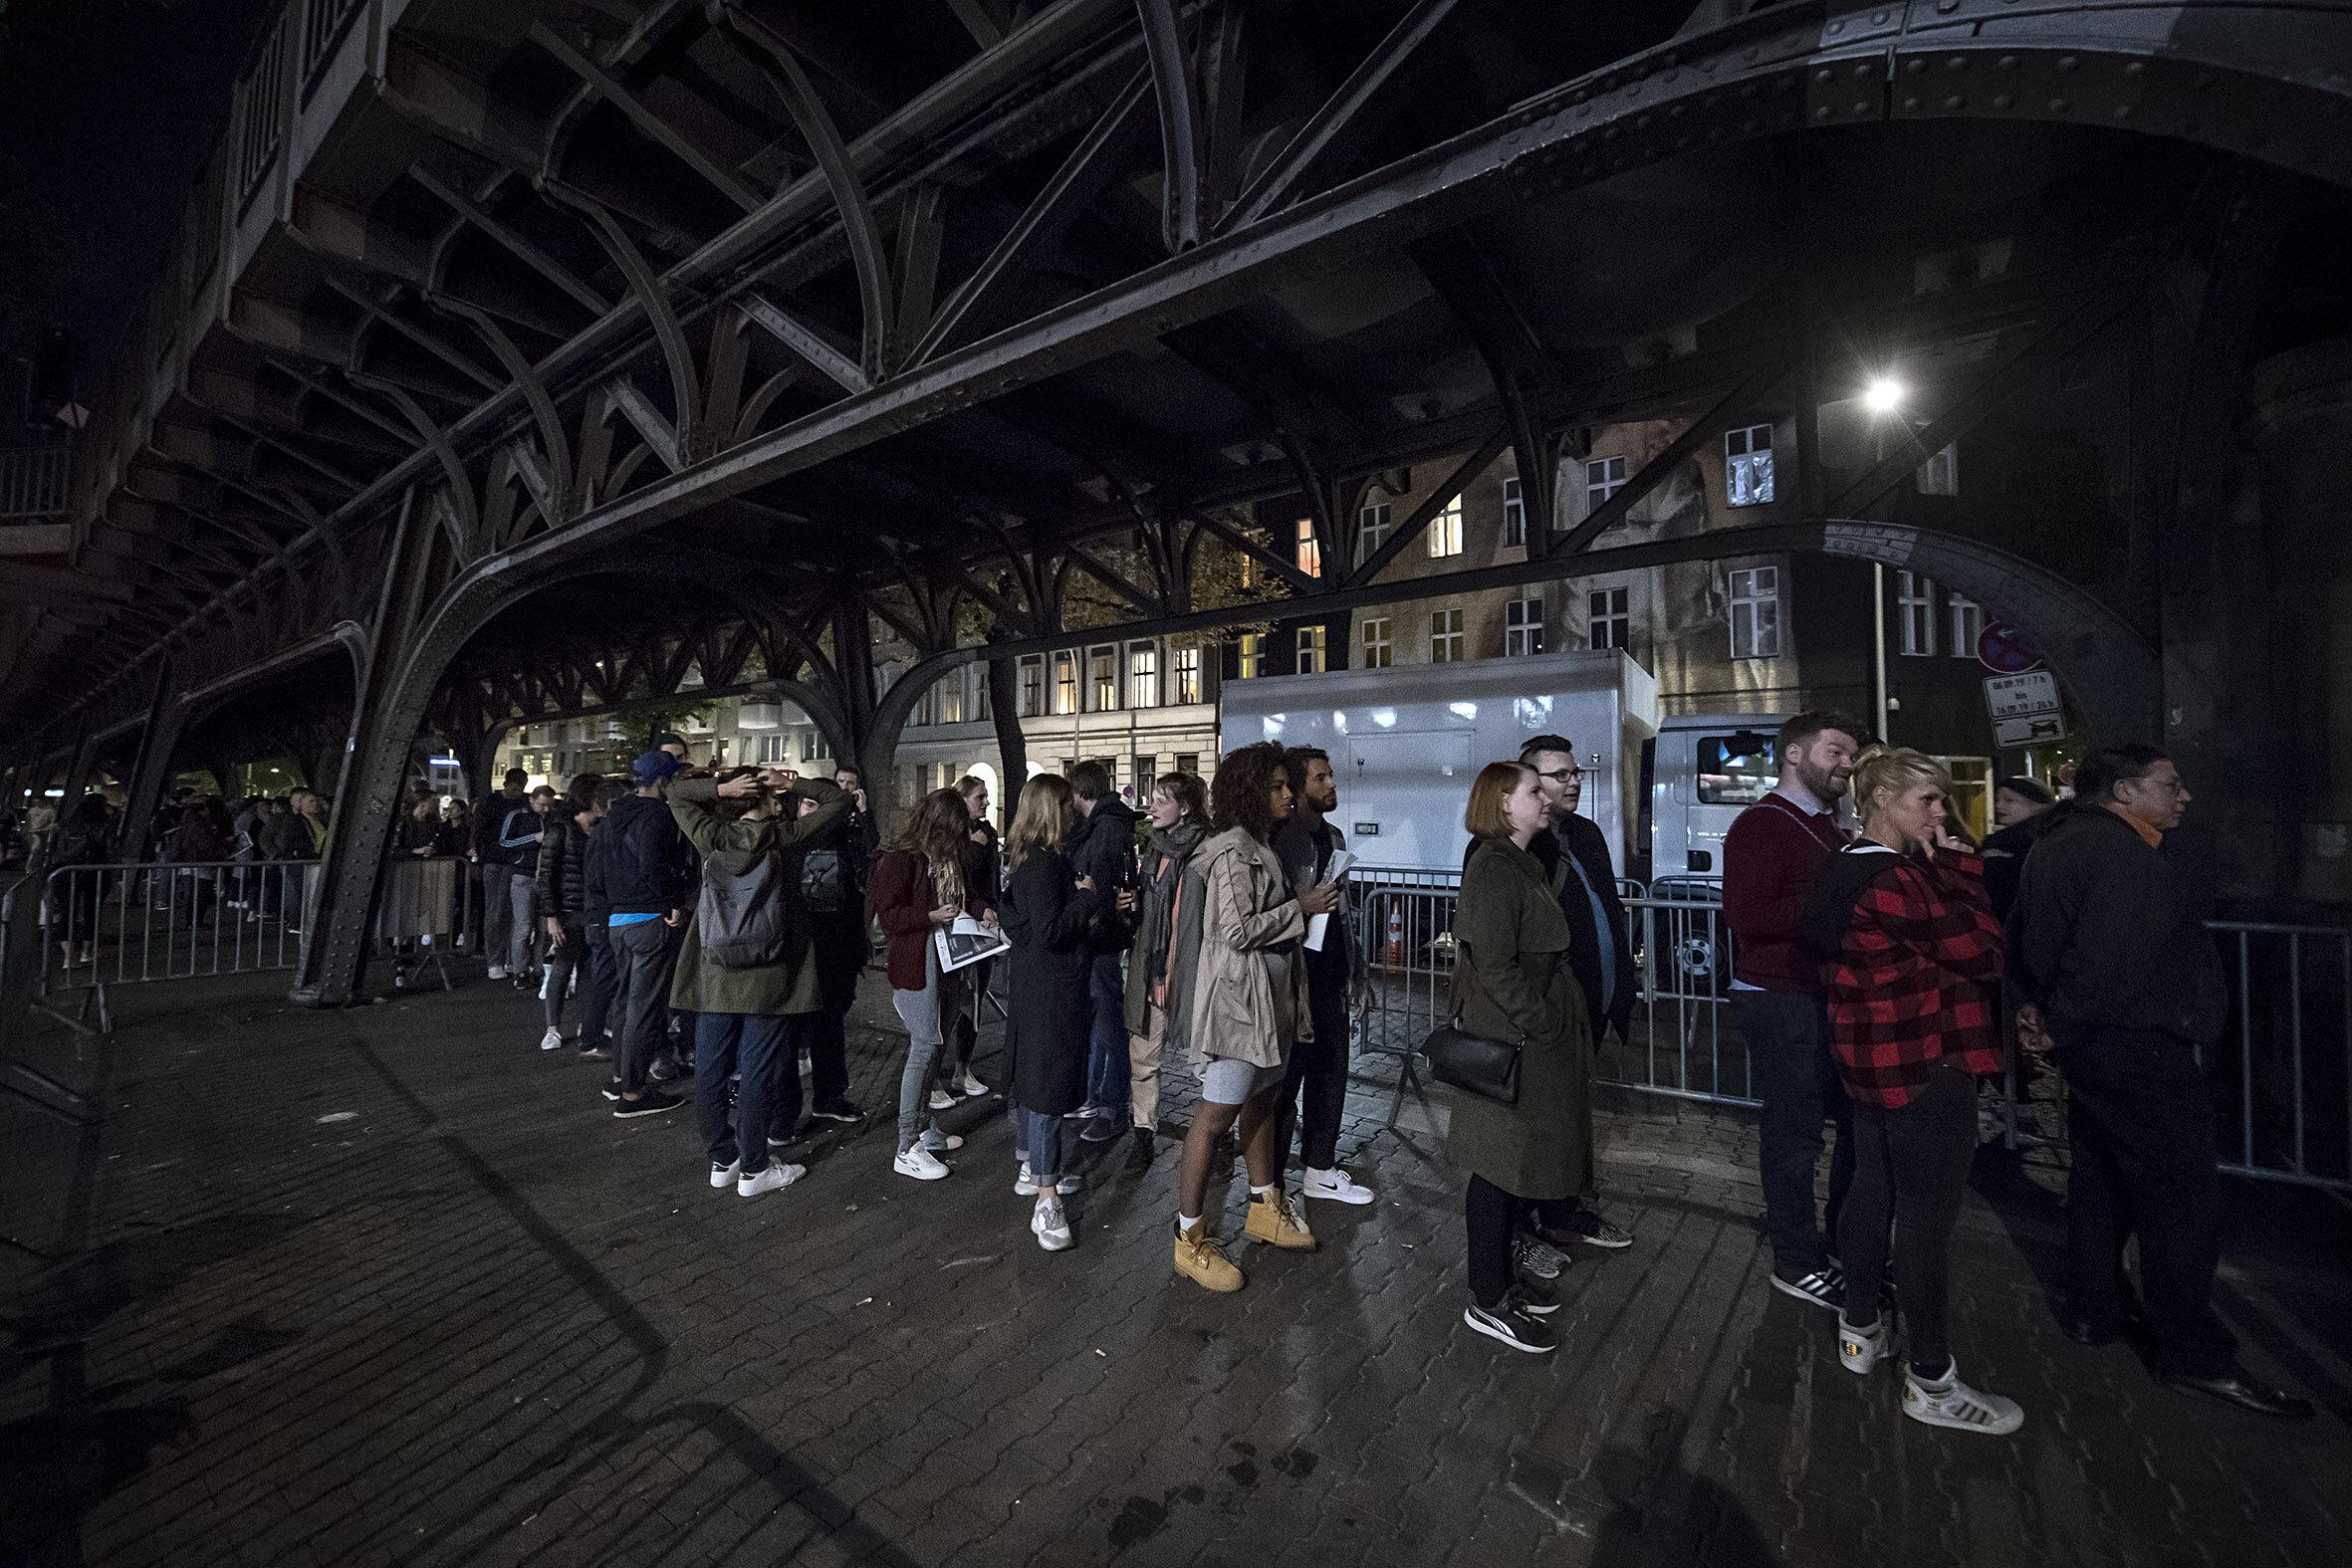 Kø. Folk sto i timesvis i kø. Det kom totalt 12000 mennesker på Biennalen (som varte tre dager).